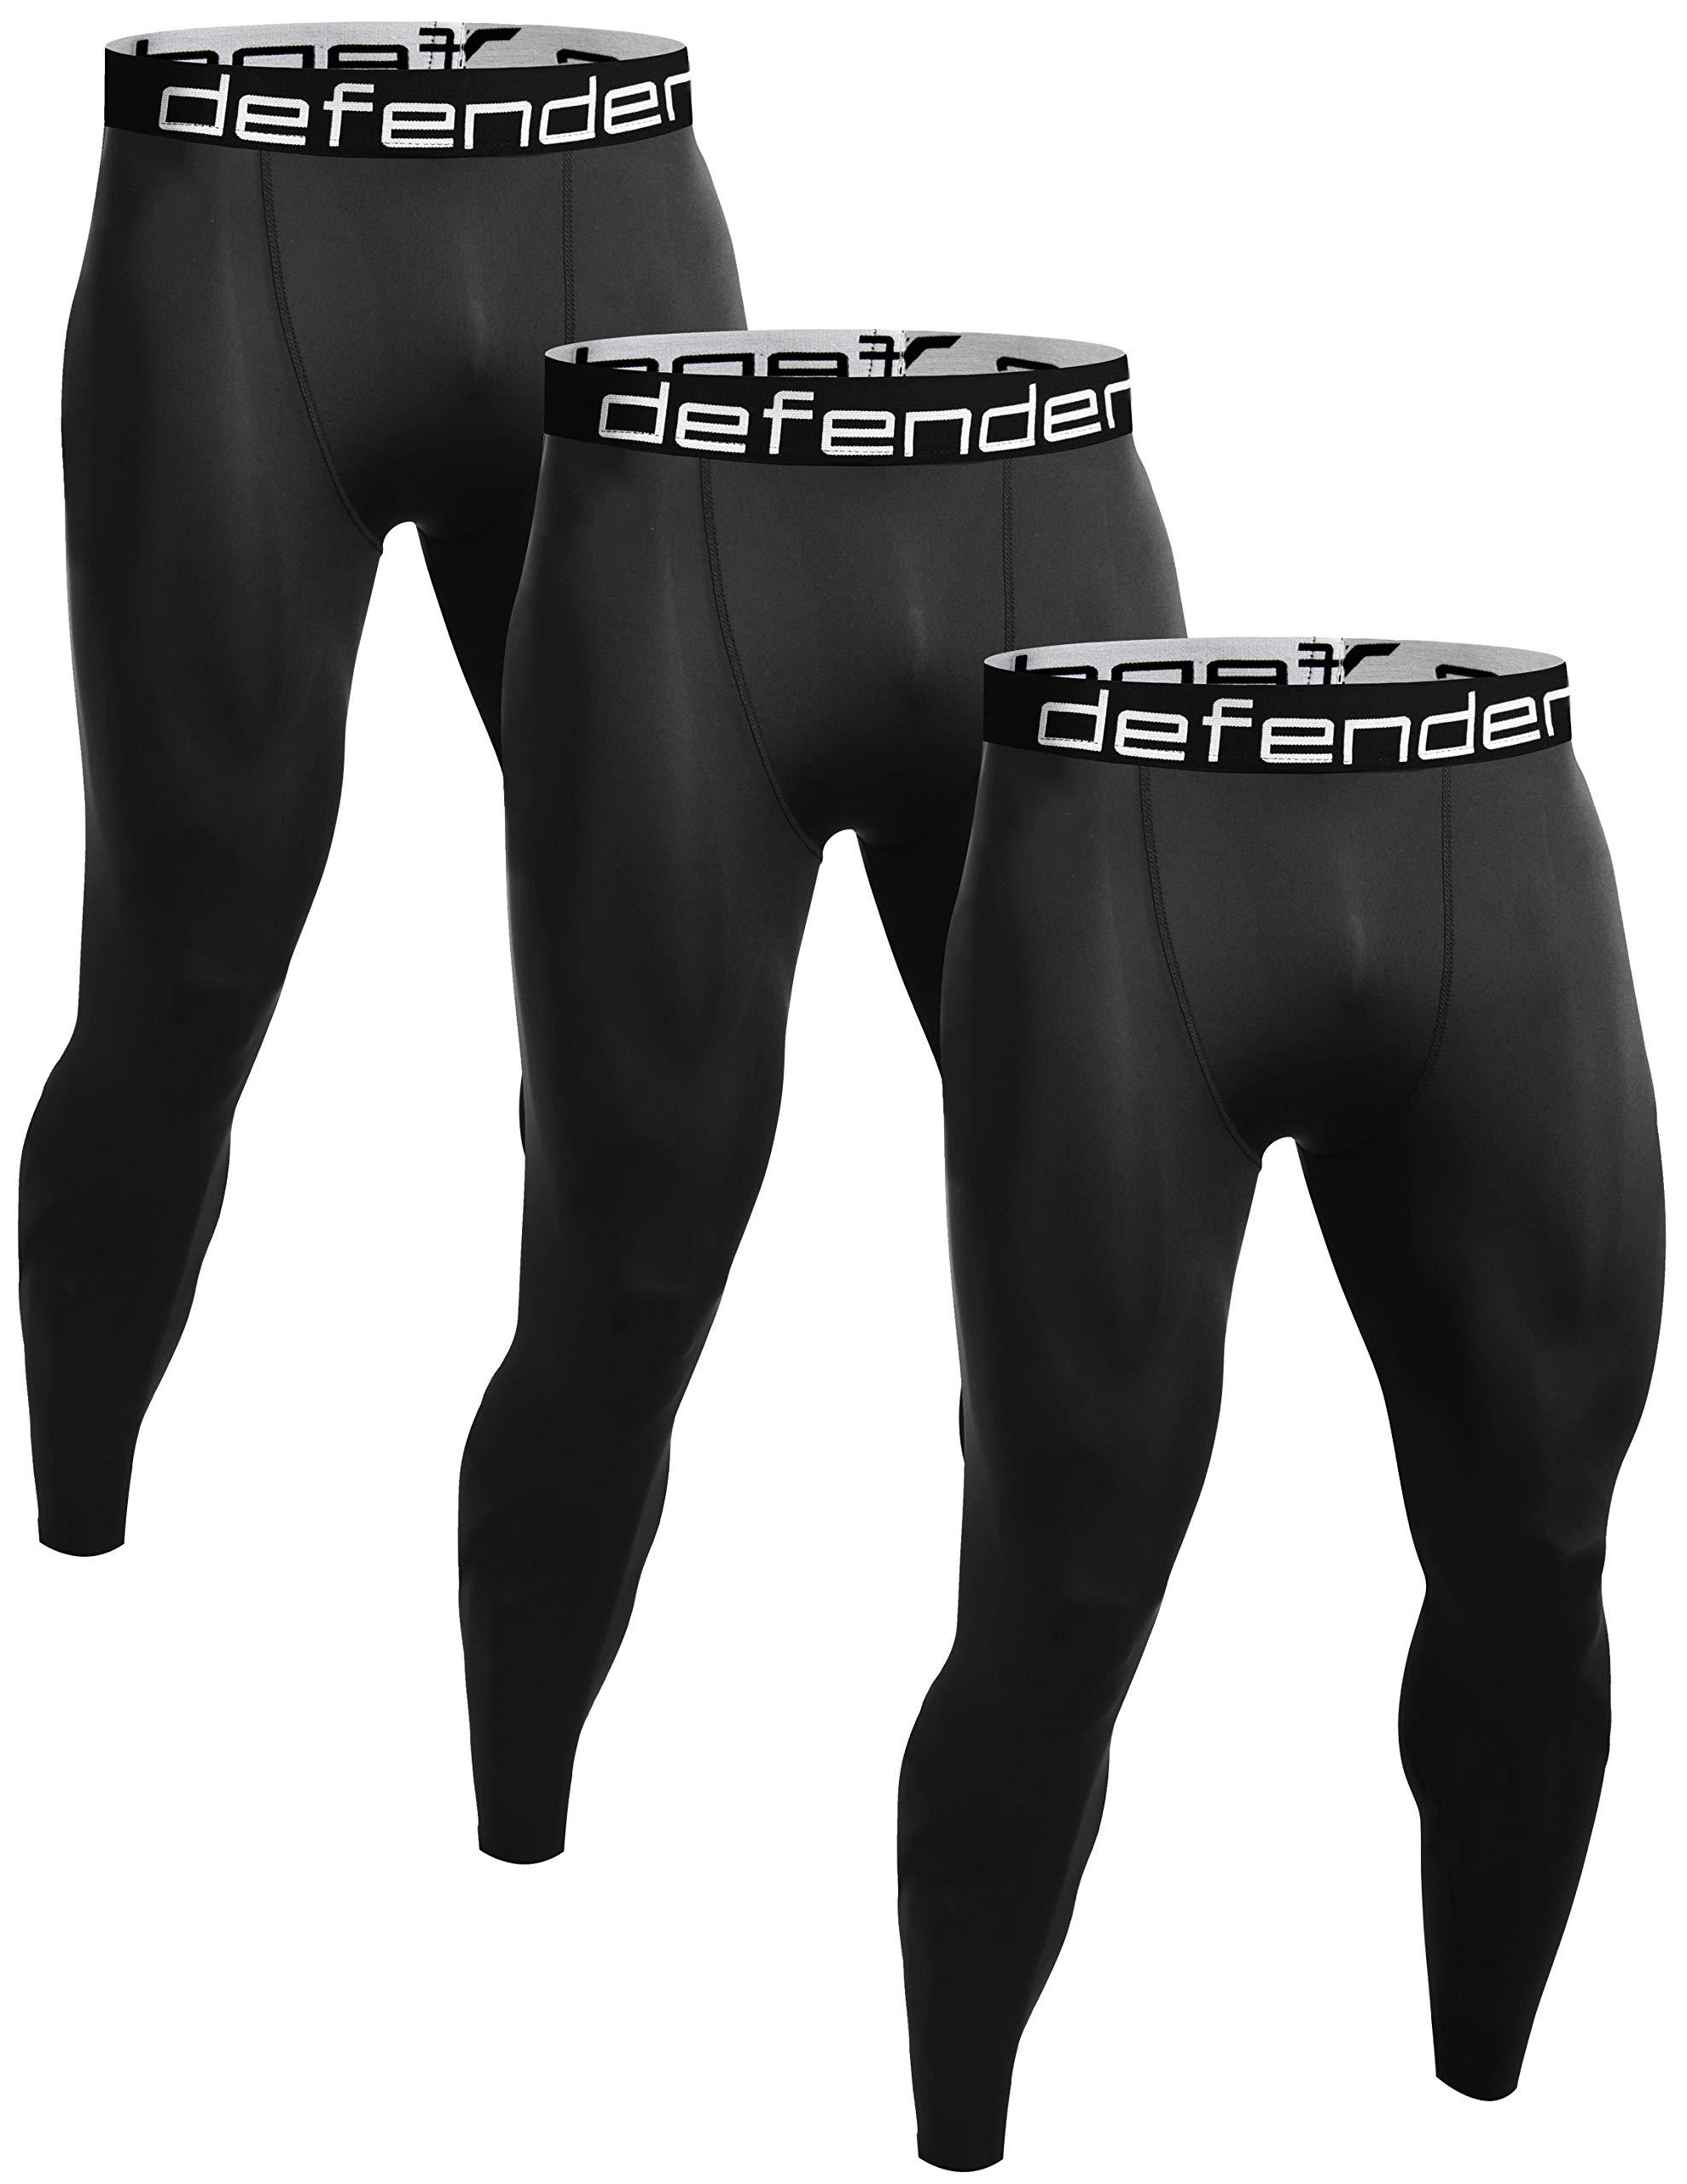 1692207cb6 Defender Men's Compression Baselayer Pants Legging Shorts Shirts Tights  Running